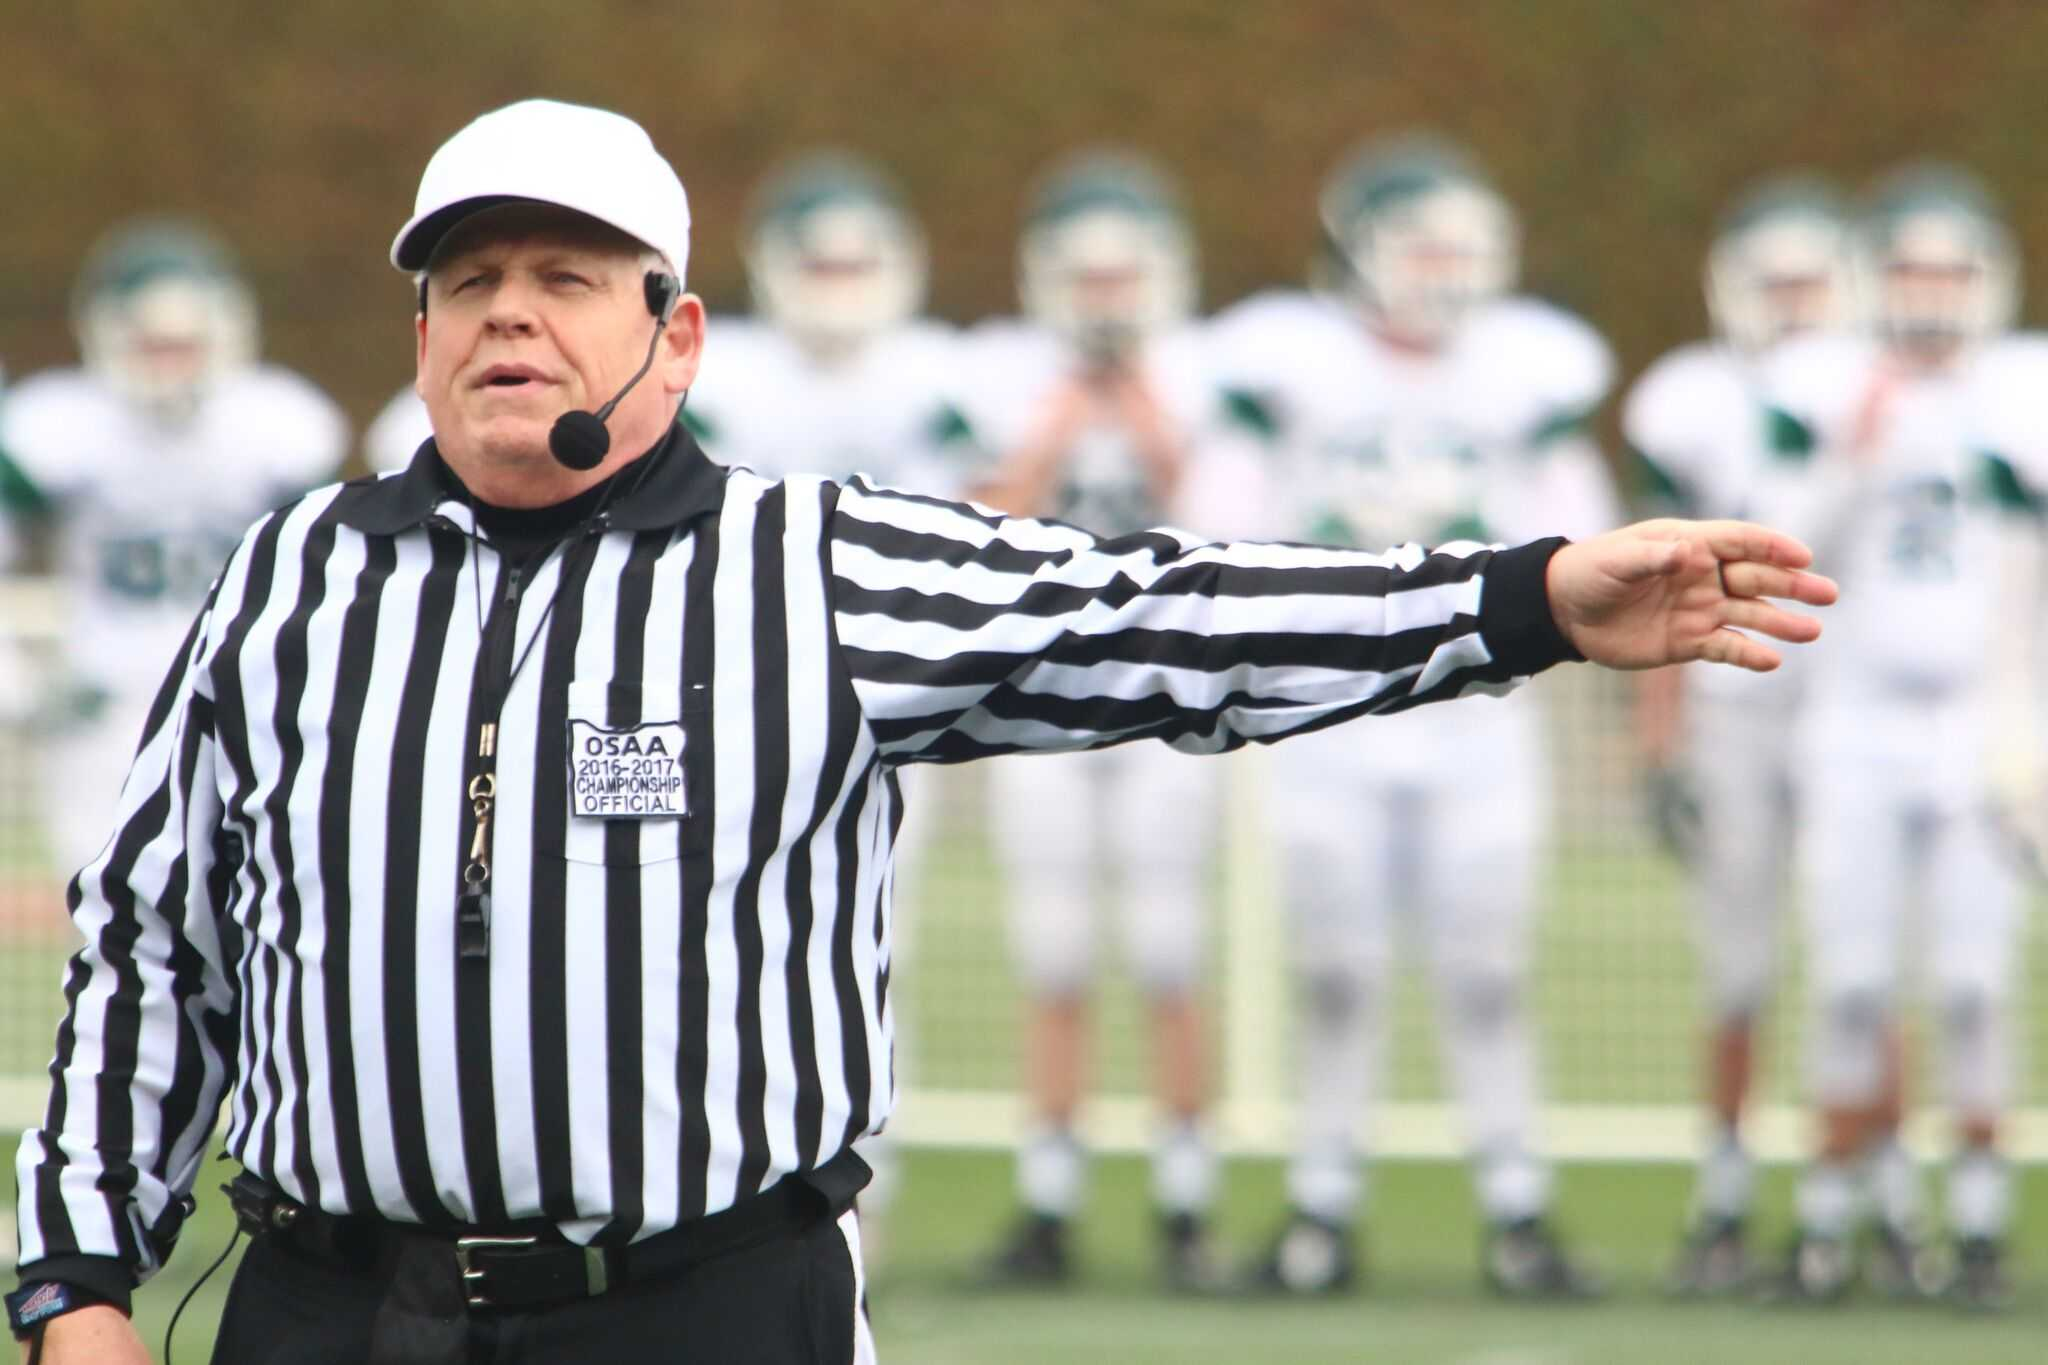 Oregon high school football had 650 officials last season, down 21.3 percent from 2010. (Northwest Sports Photography)